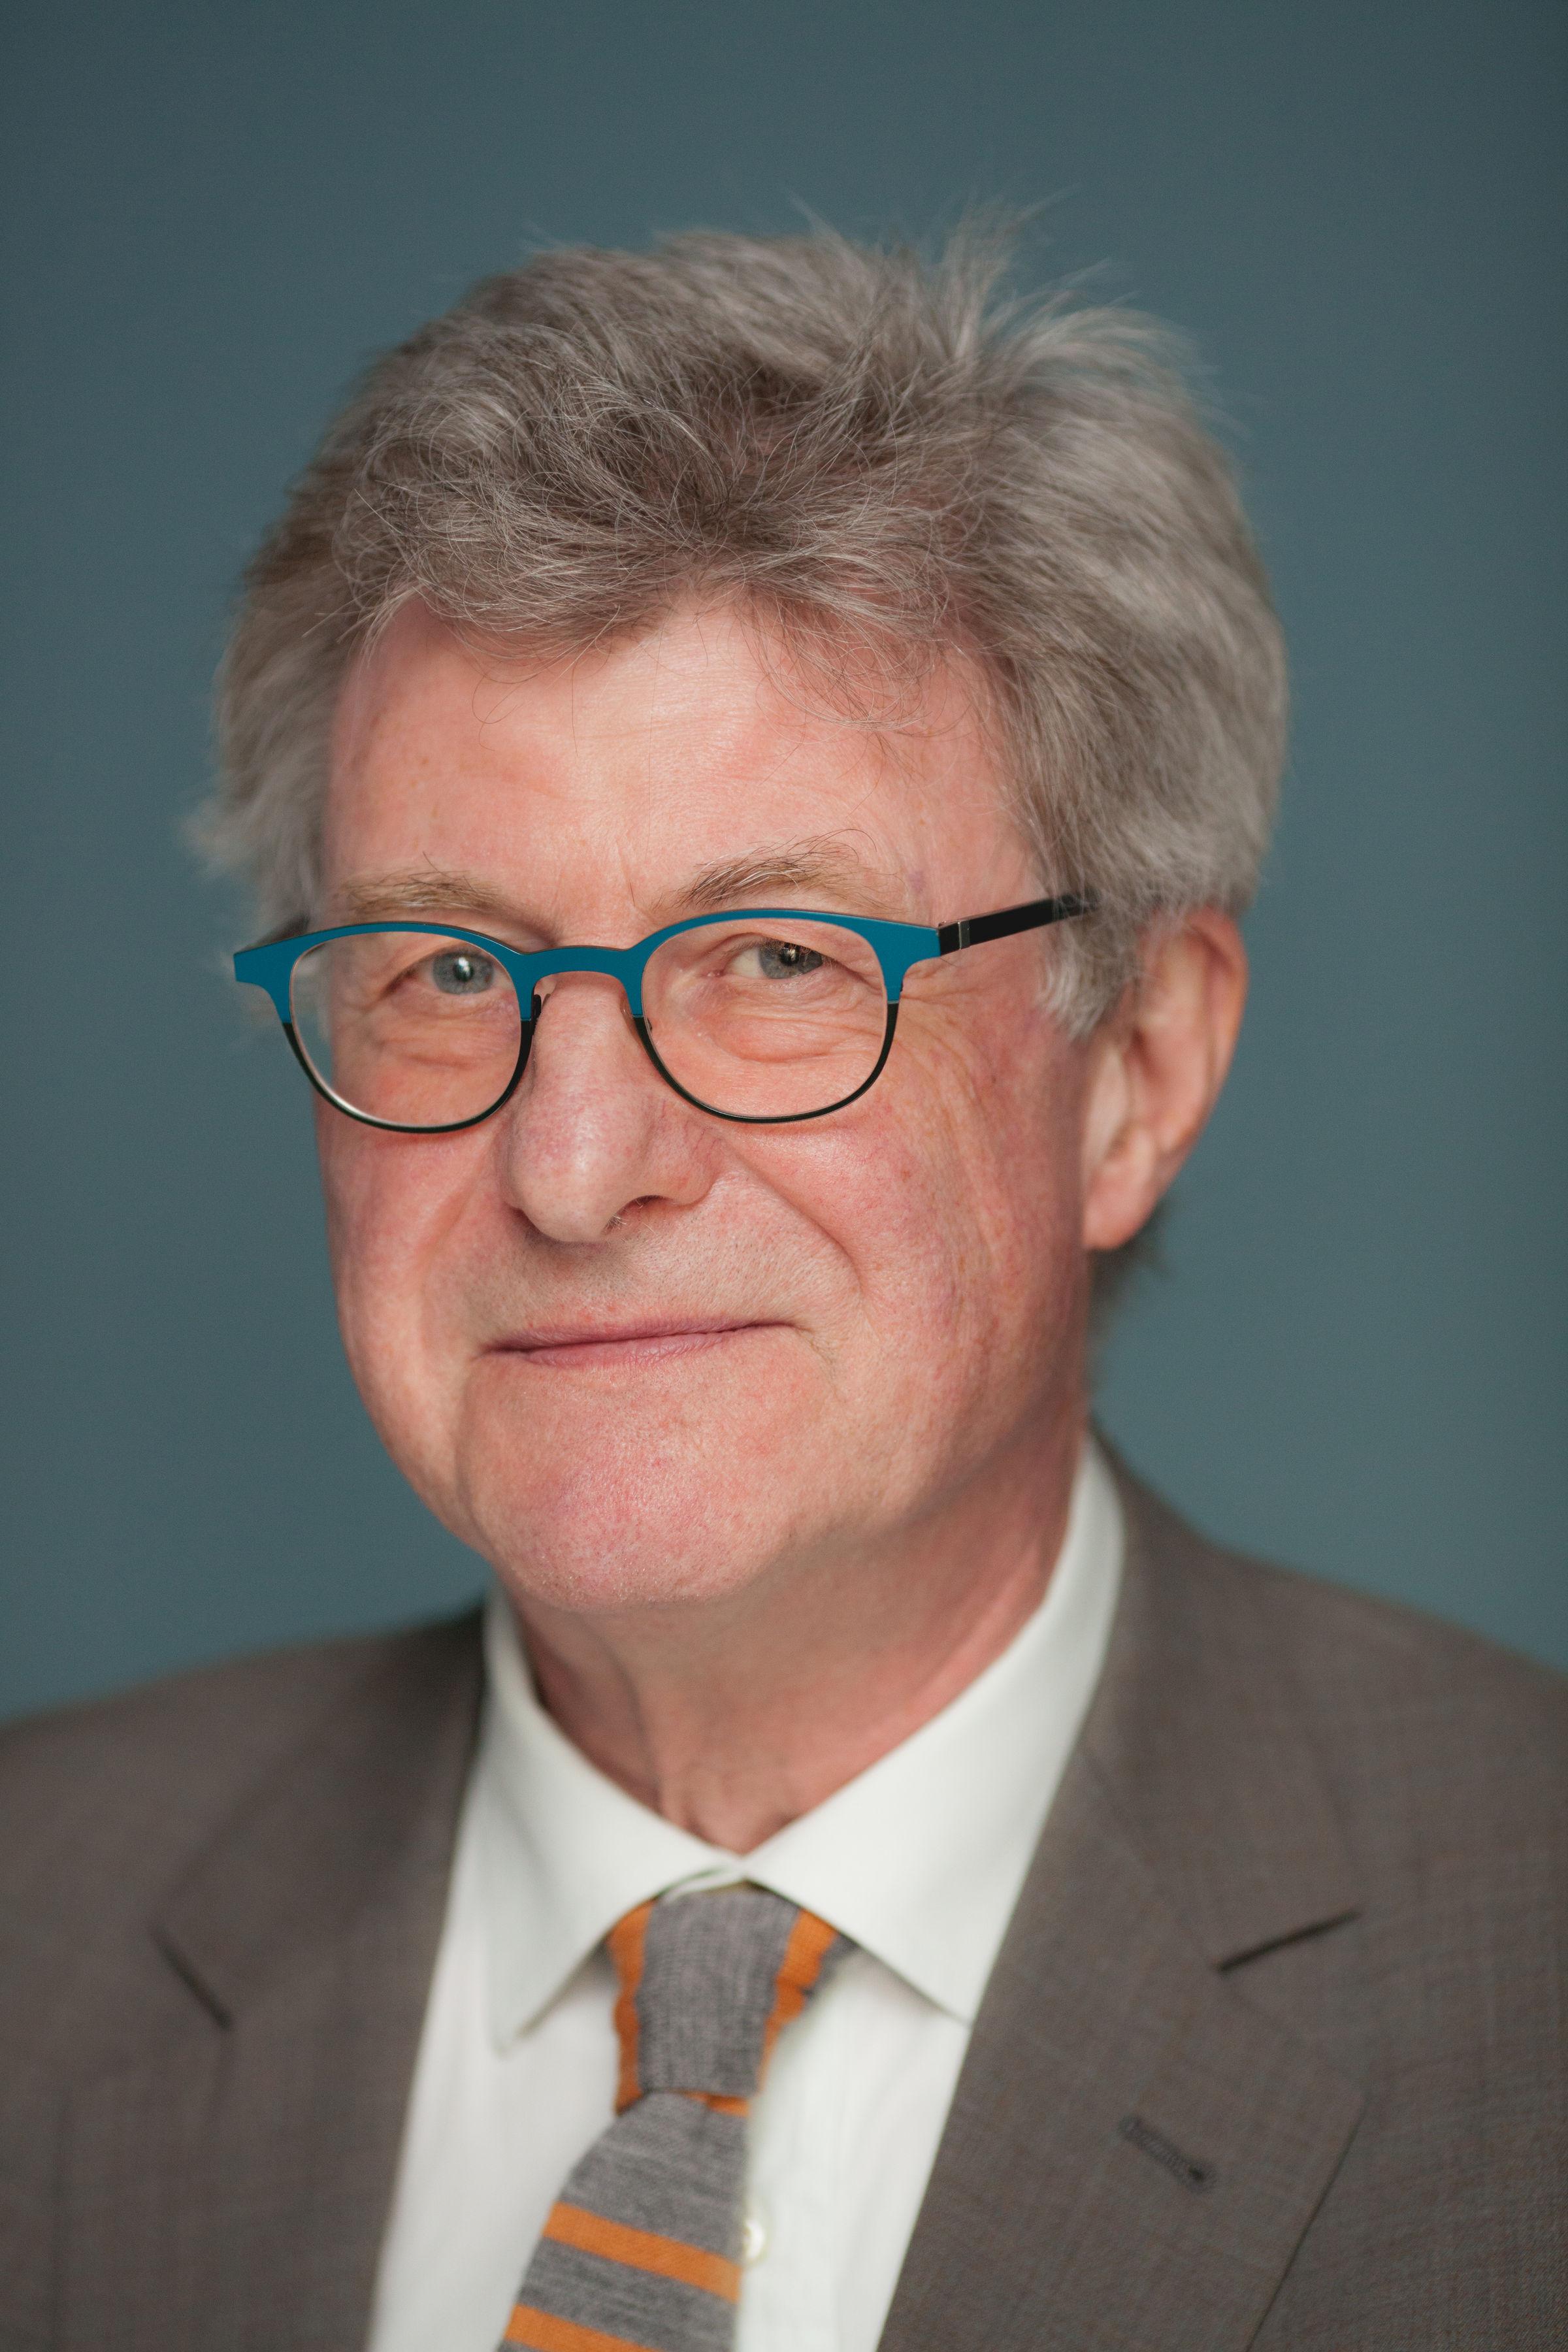 Michael Alcock